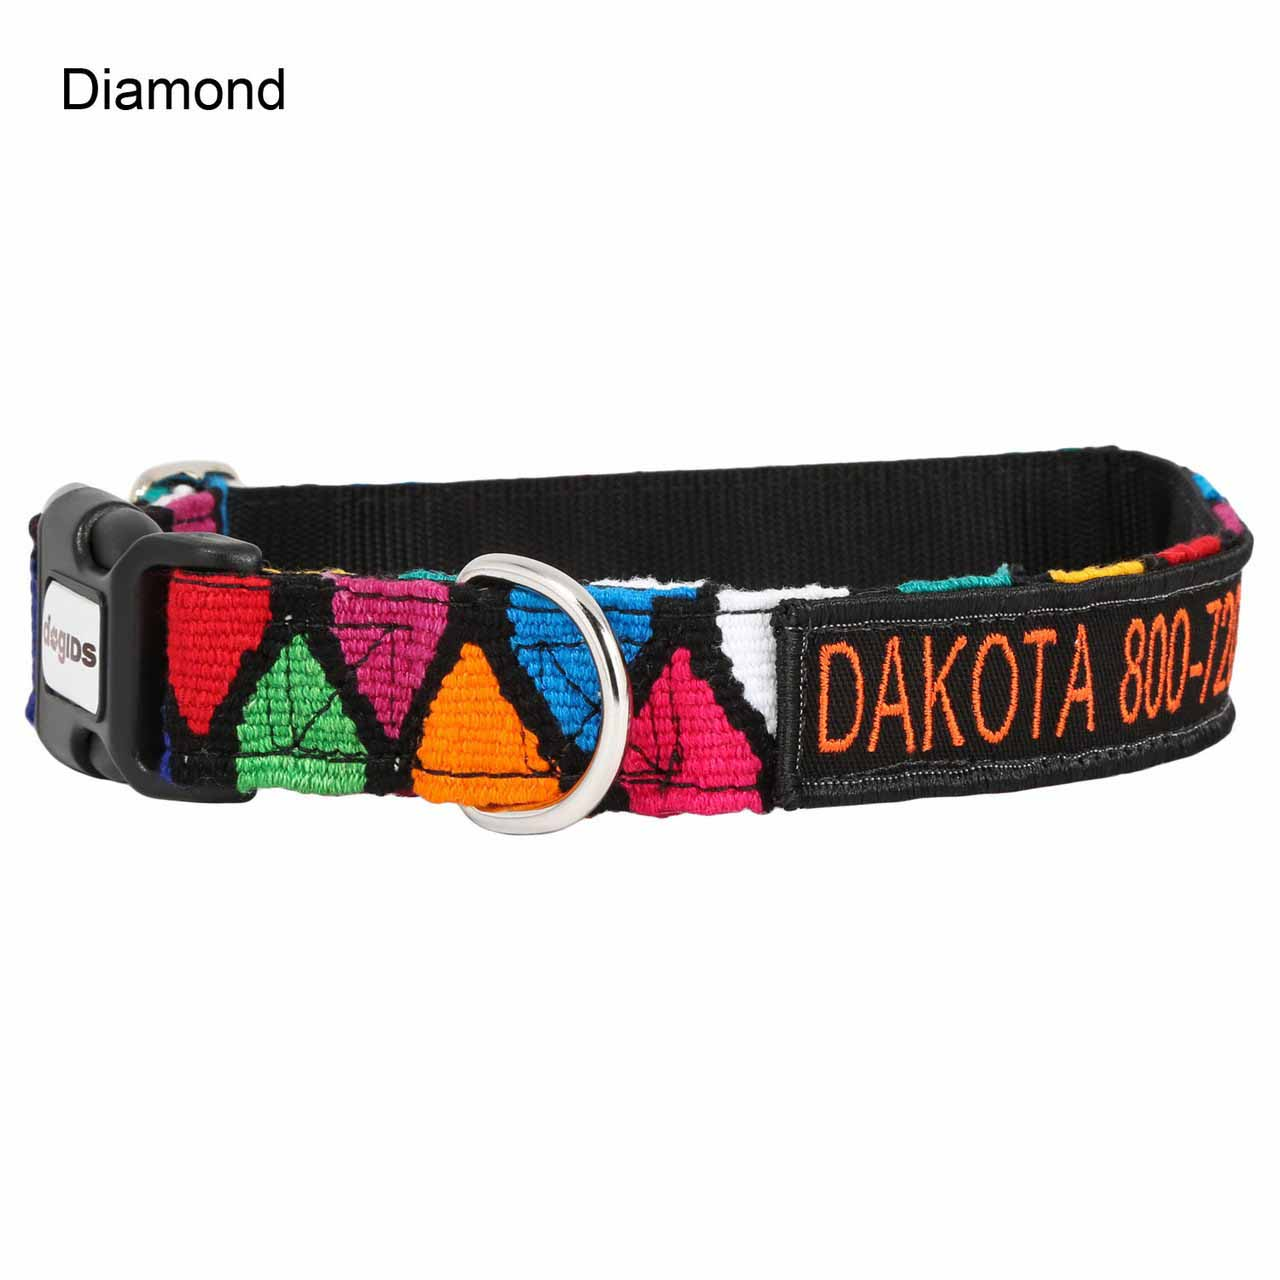 Embroidered Maya Personalized Dog Collar Diamond